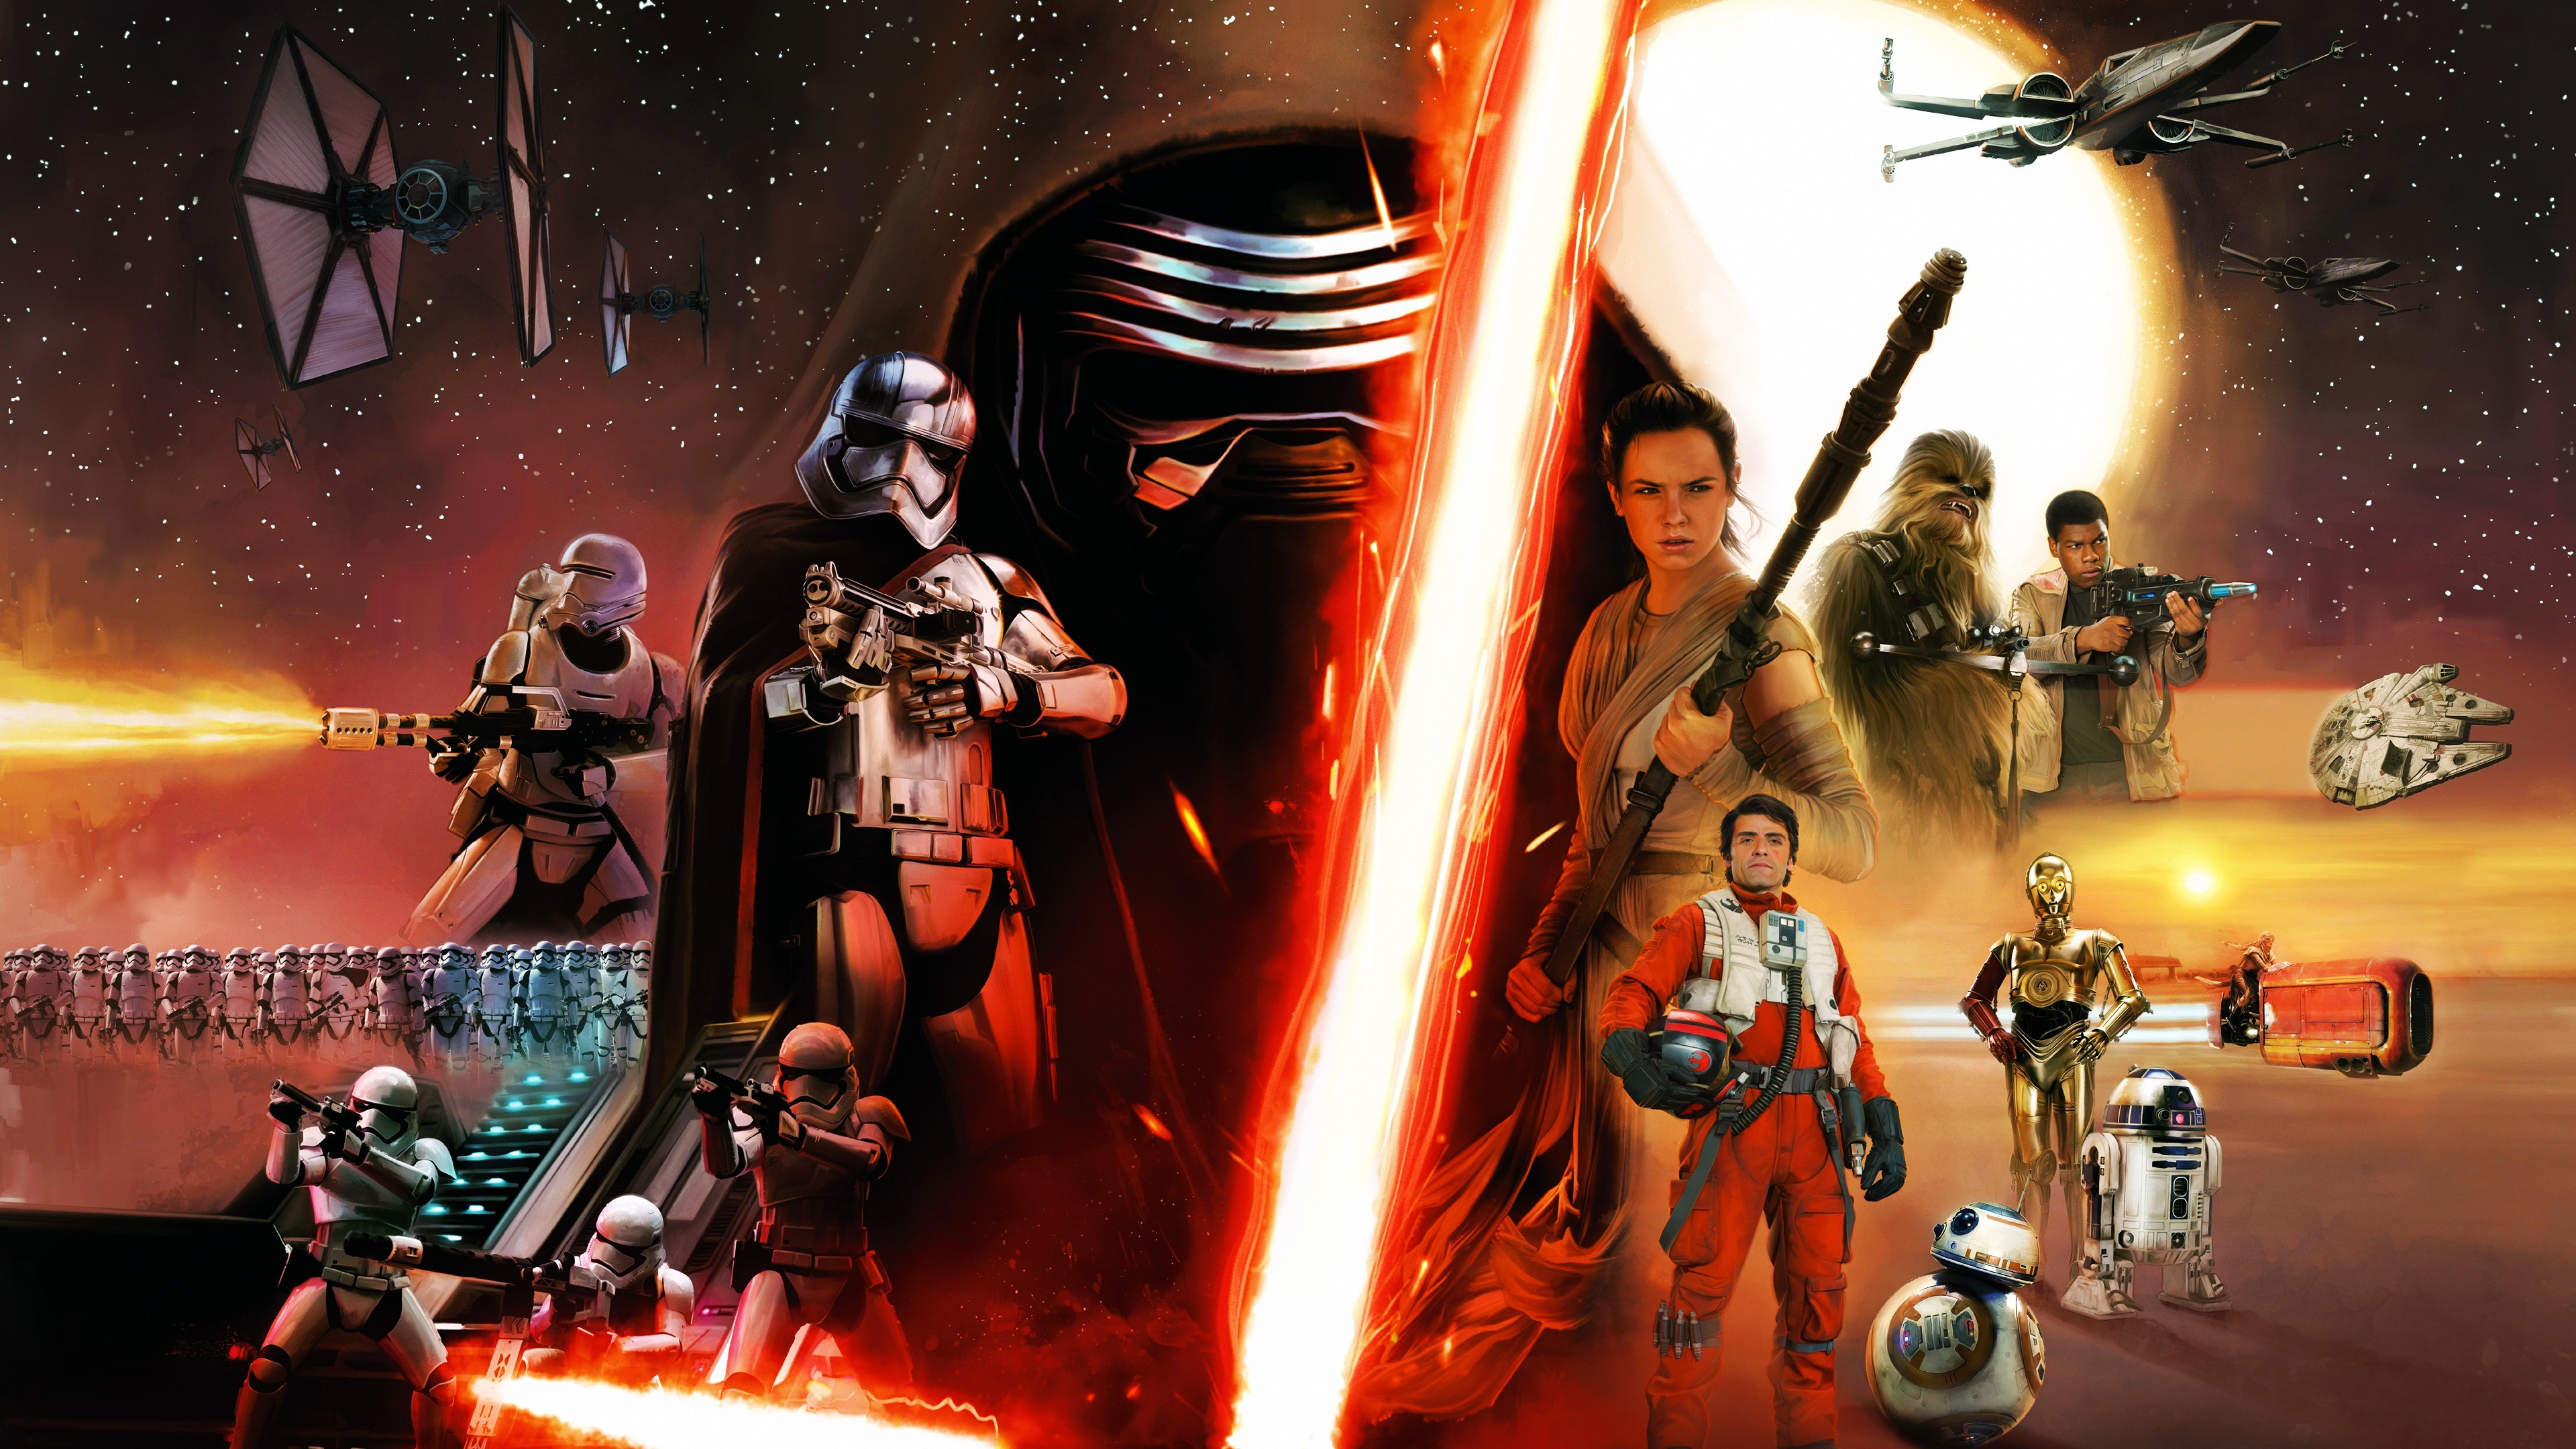 Star Wars Episode 7 Wallpaper Download Free Stunning High